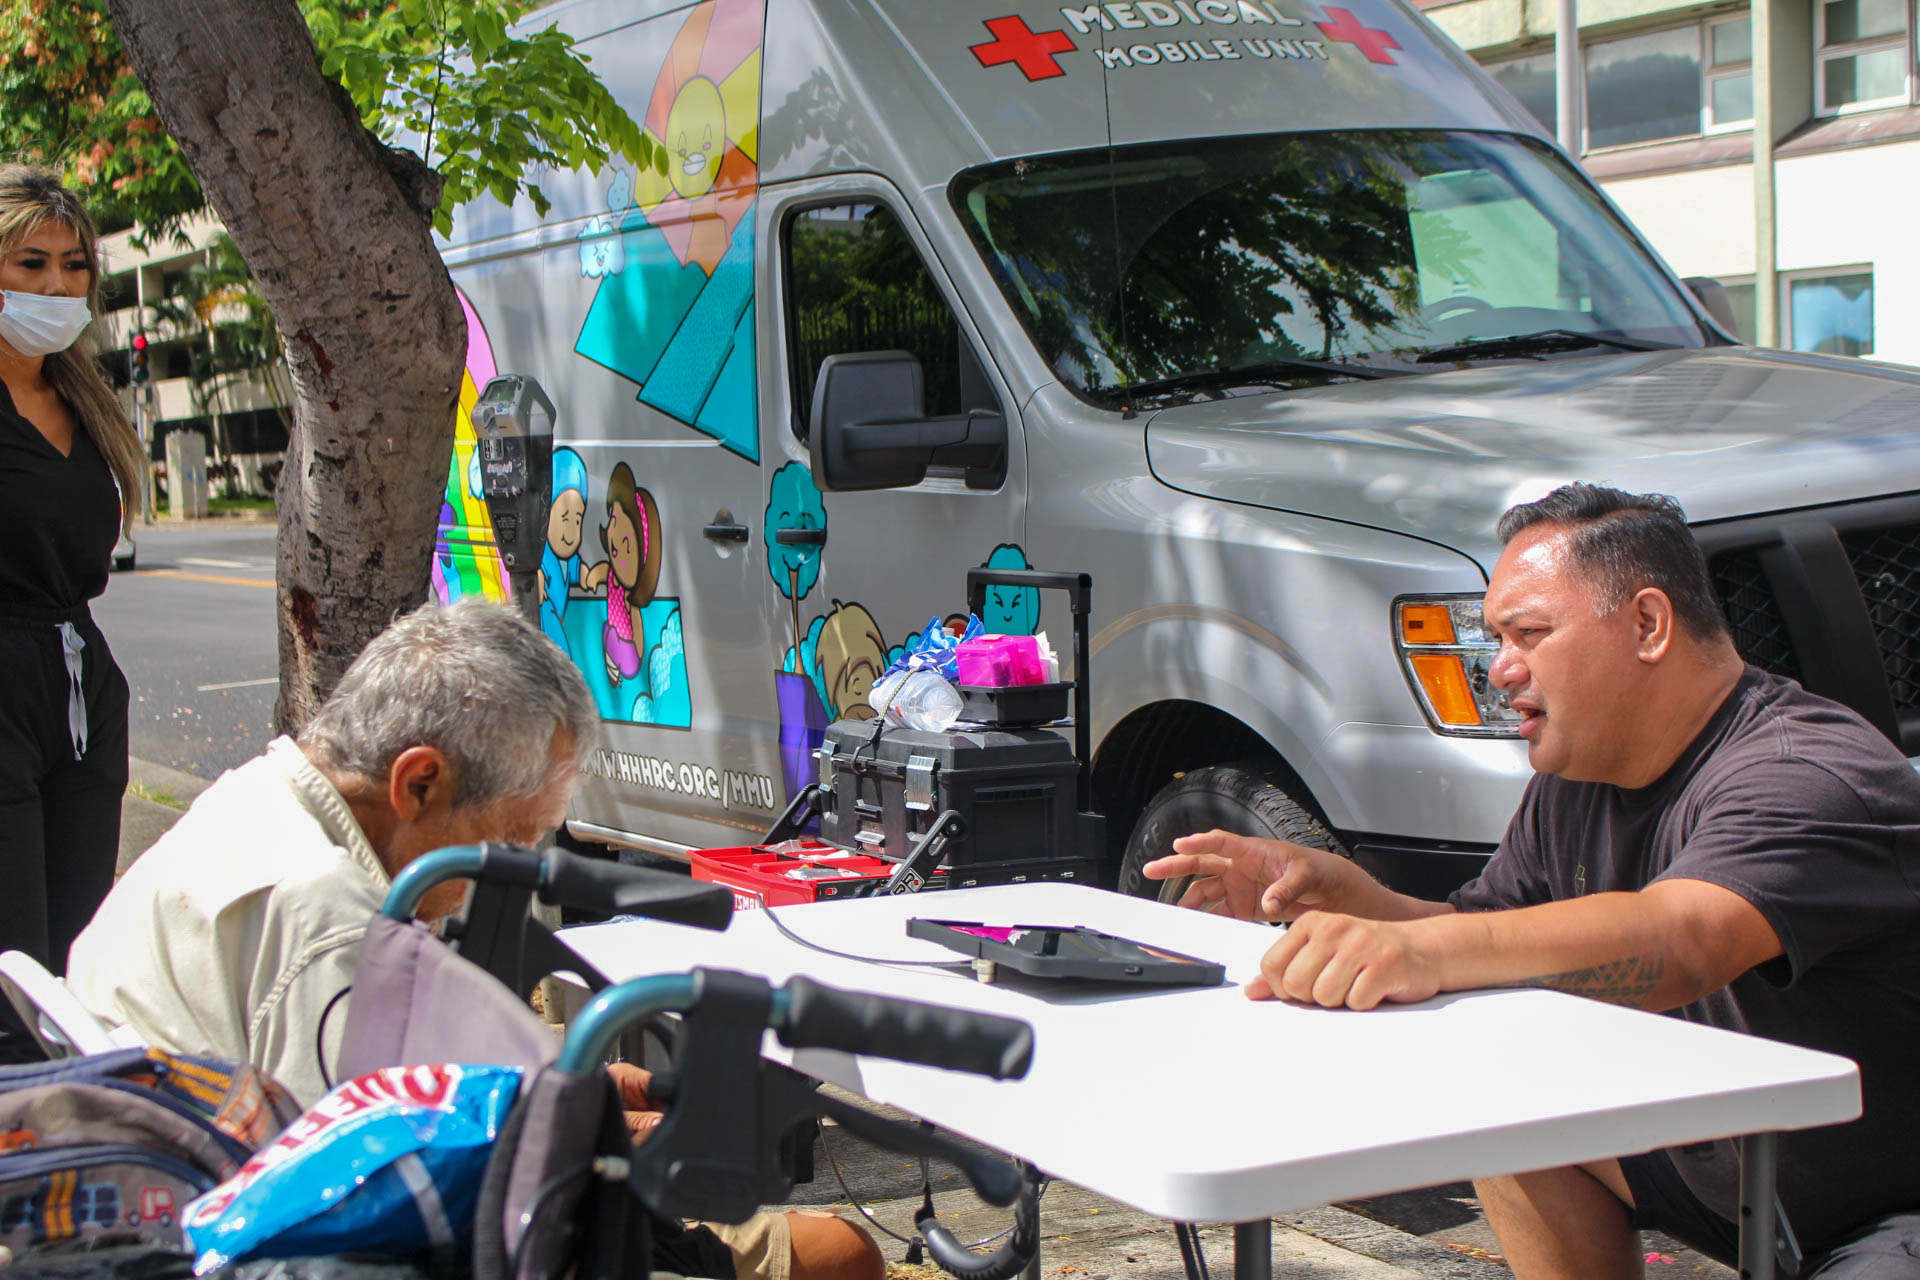 Kaiser Permanente Hawaiʻi Donates $143,000 To Expand Telehealth Services